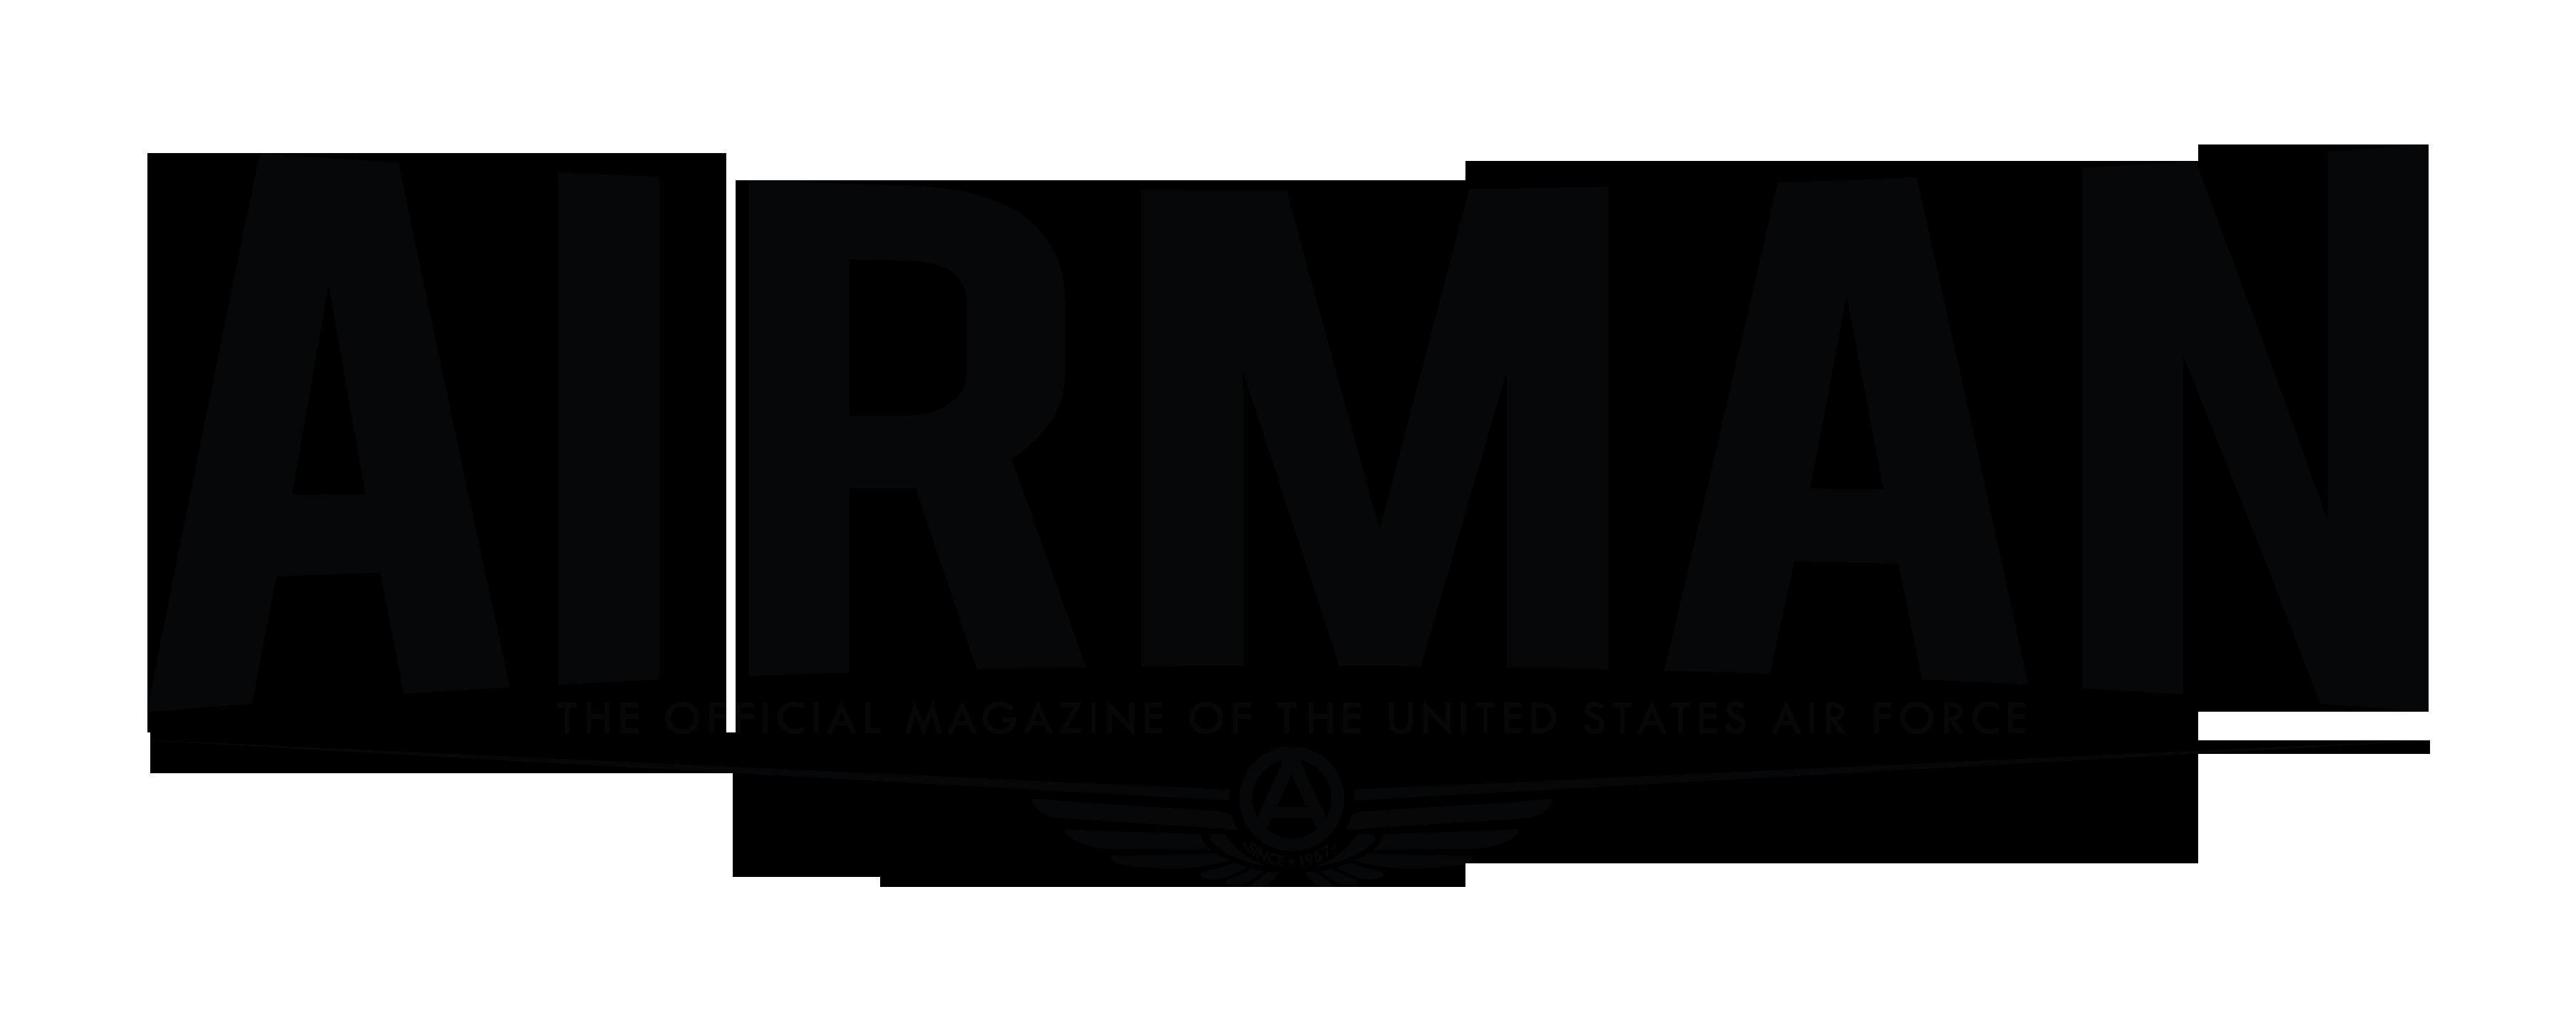 defense media activity dma products service magazines airmen